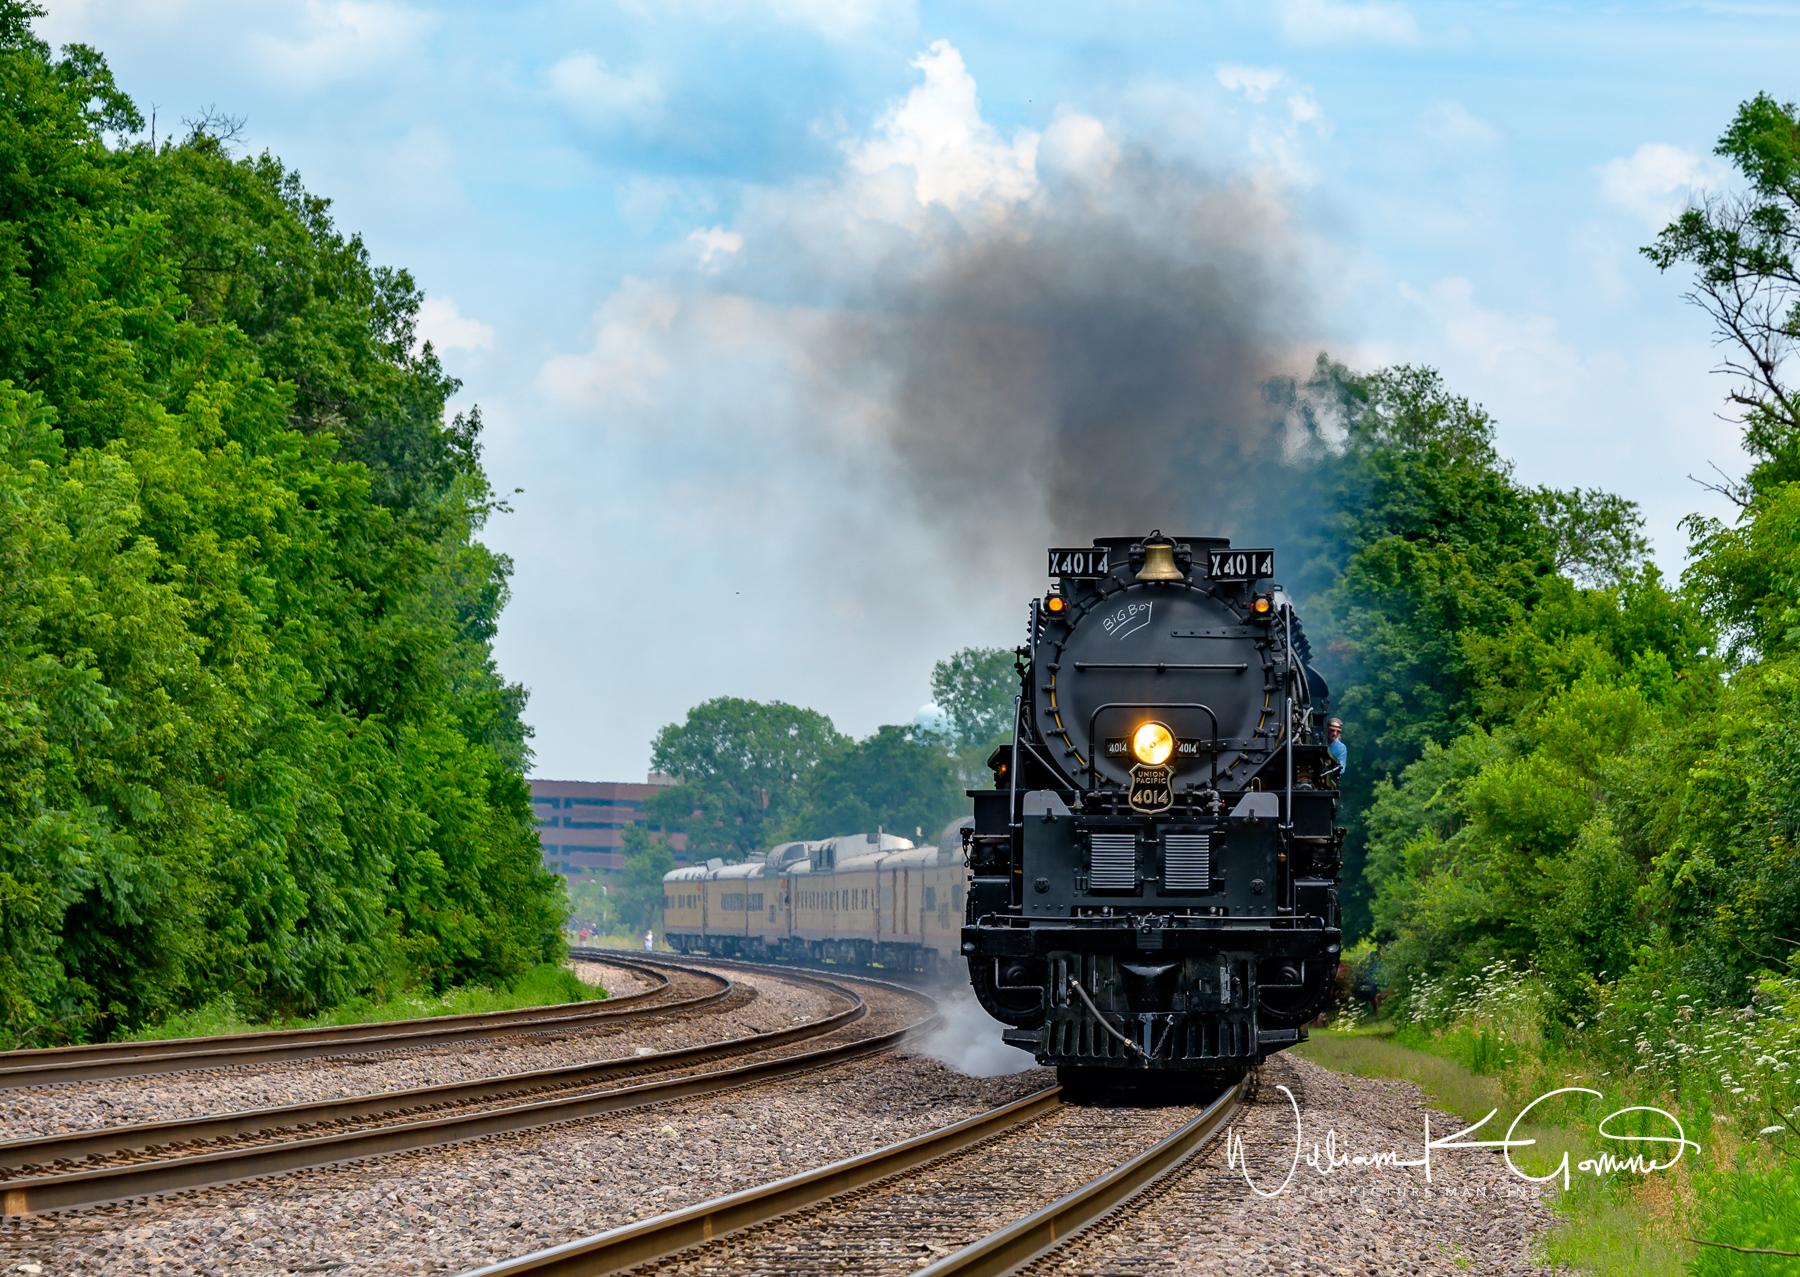 Union Pacific Big Boy 4014 steams down the track in Winfield, IL.